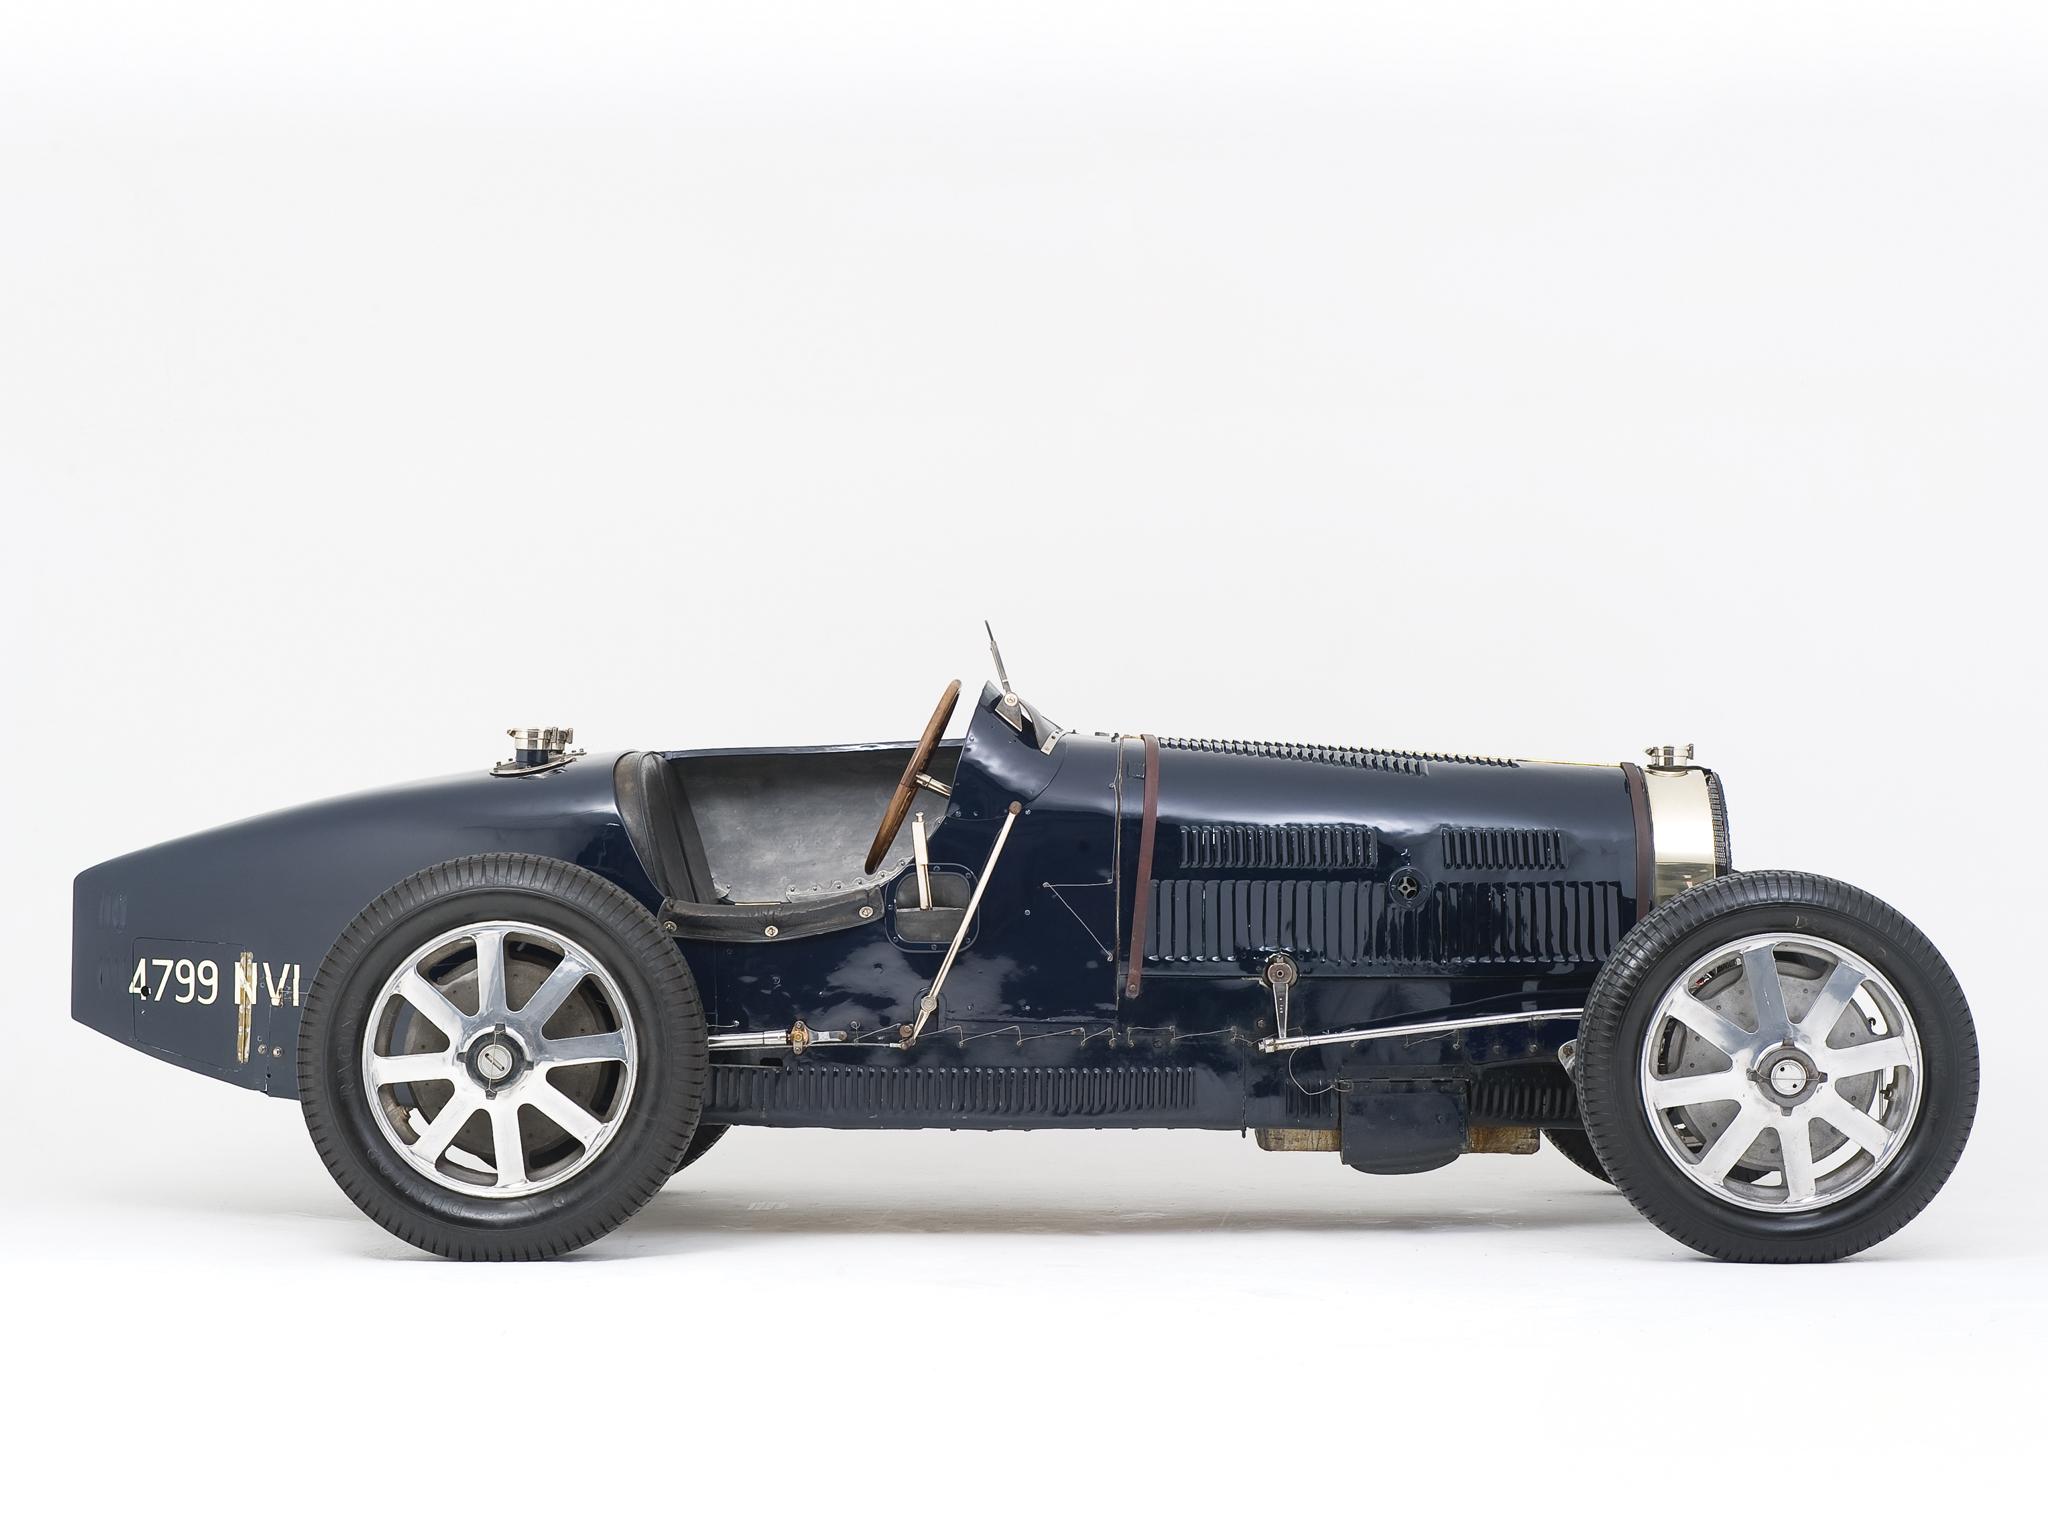 1932 bugatti type 51 grand prix retro race racing f wallpaper 2048x1536 93681 wallpaperup. Black Bedroom Furniture Sets. Home Design Ideas